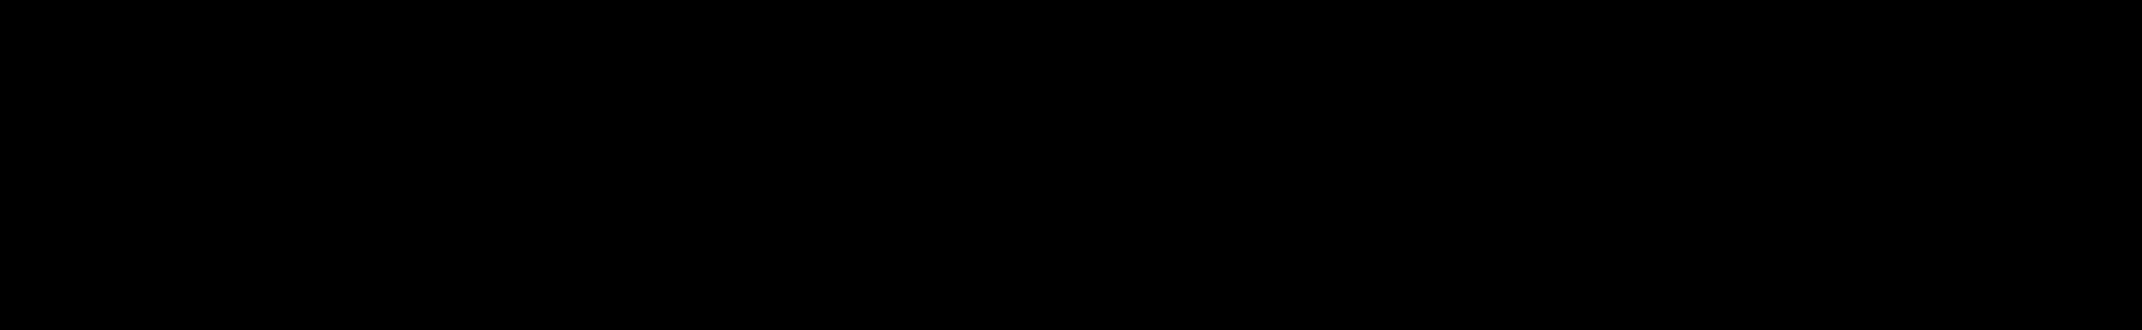 4,7,10,13,16-Docosapentaenoic acid